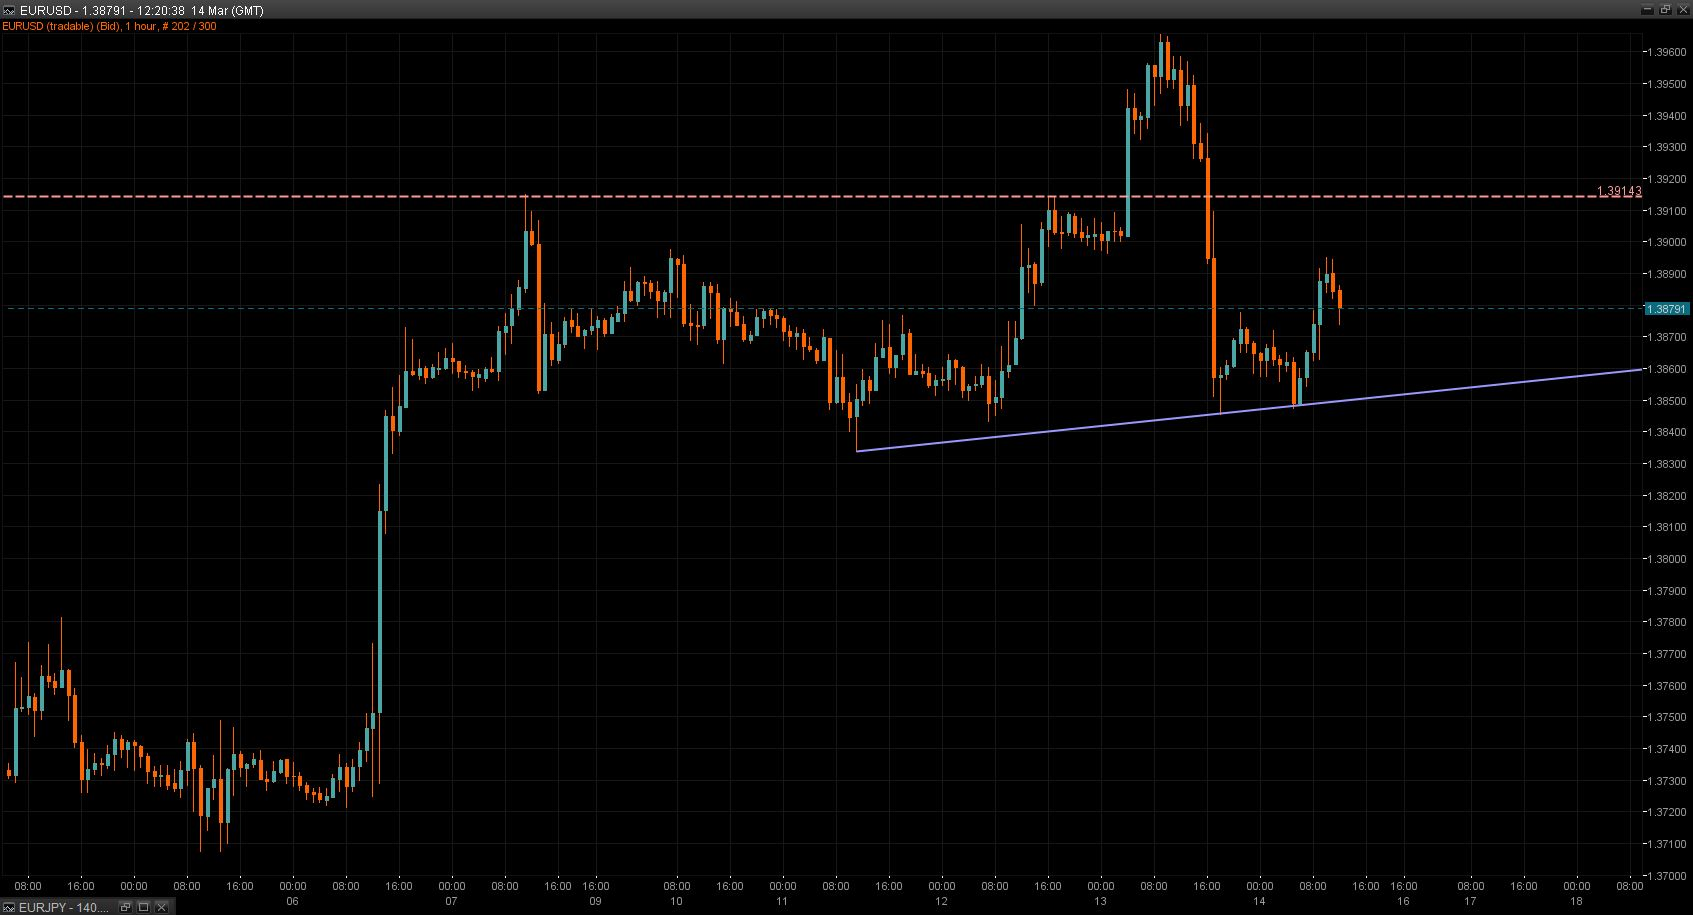 EUR/USD Chart 14 Mar 2014